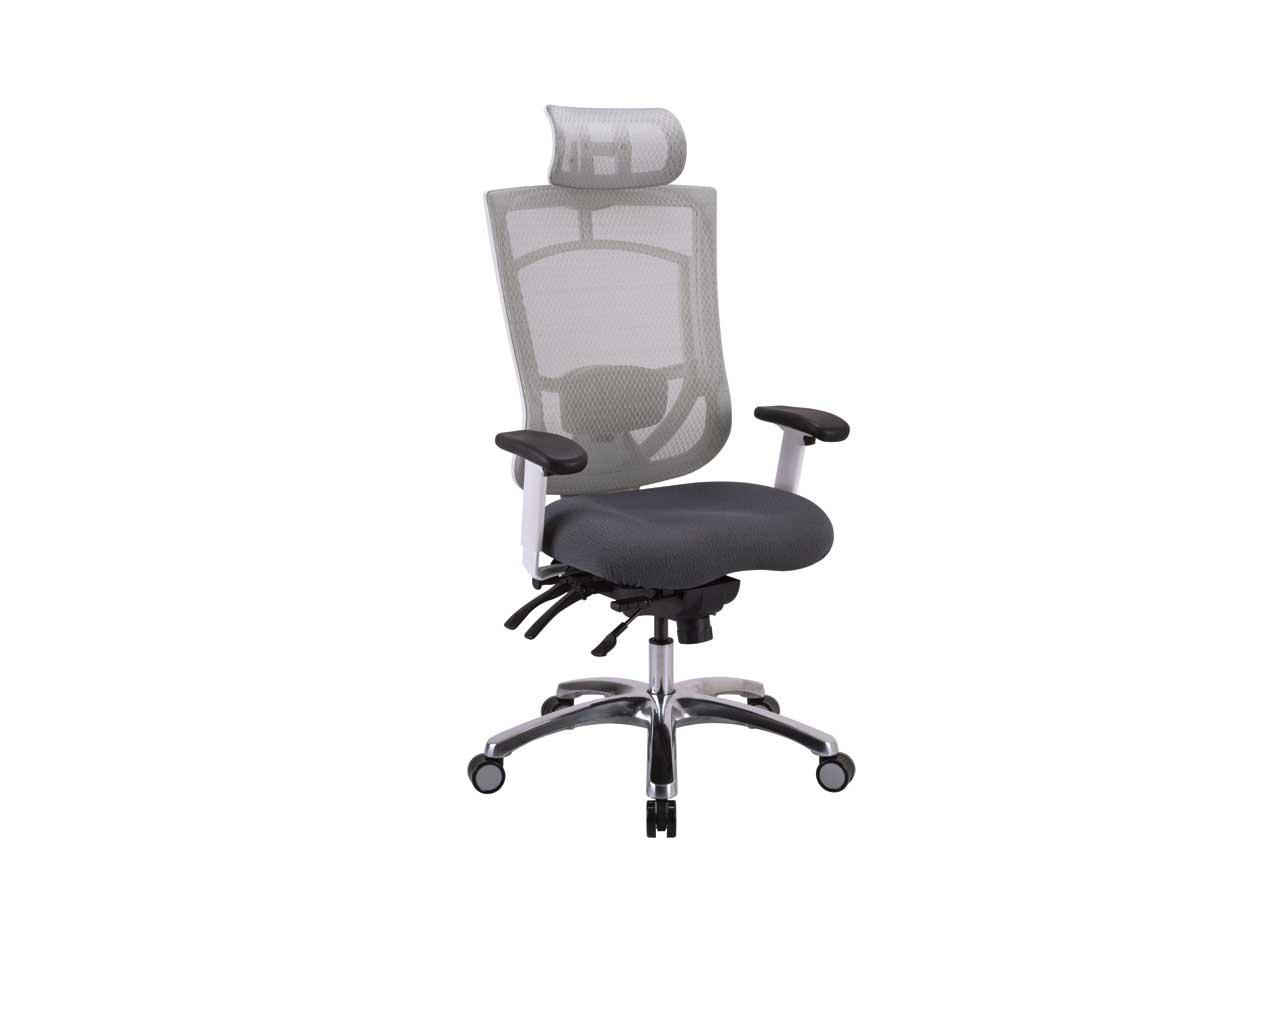 CoolMesh Pro Plus with Headrest - Grey